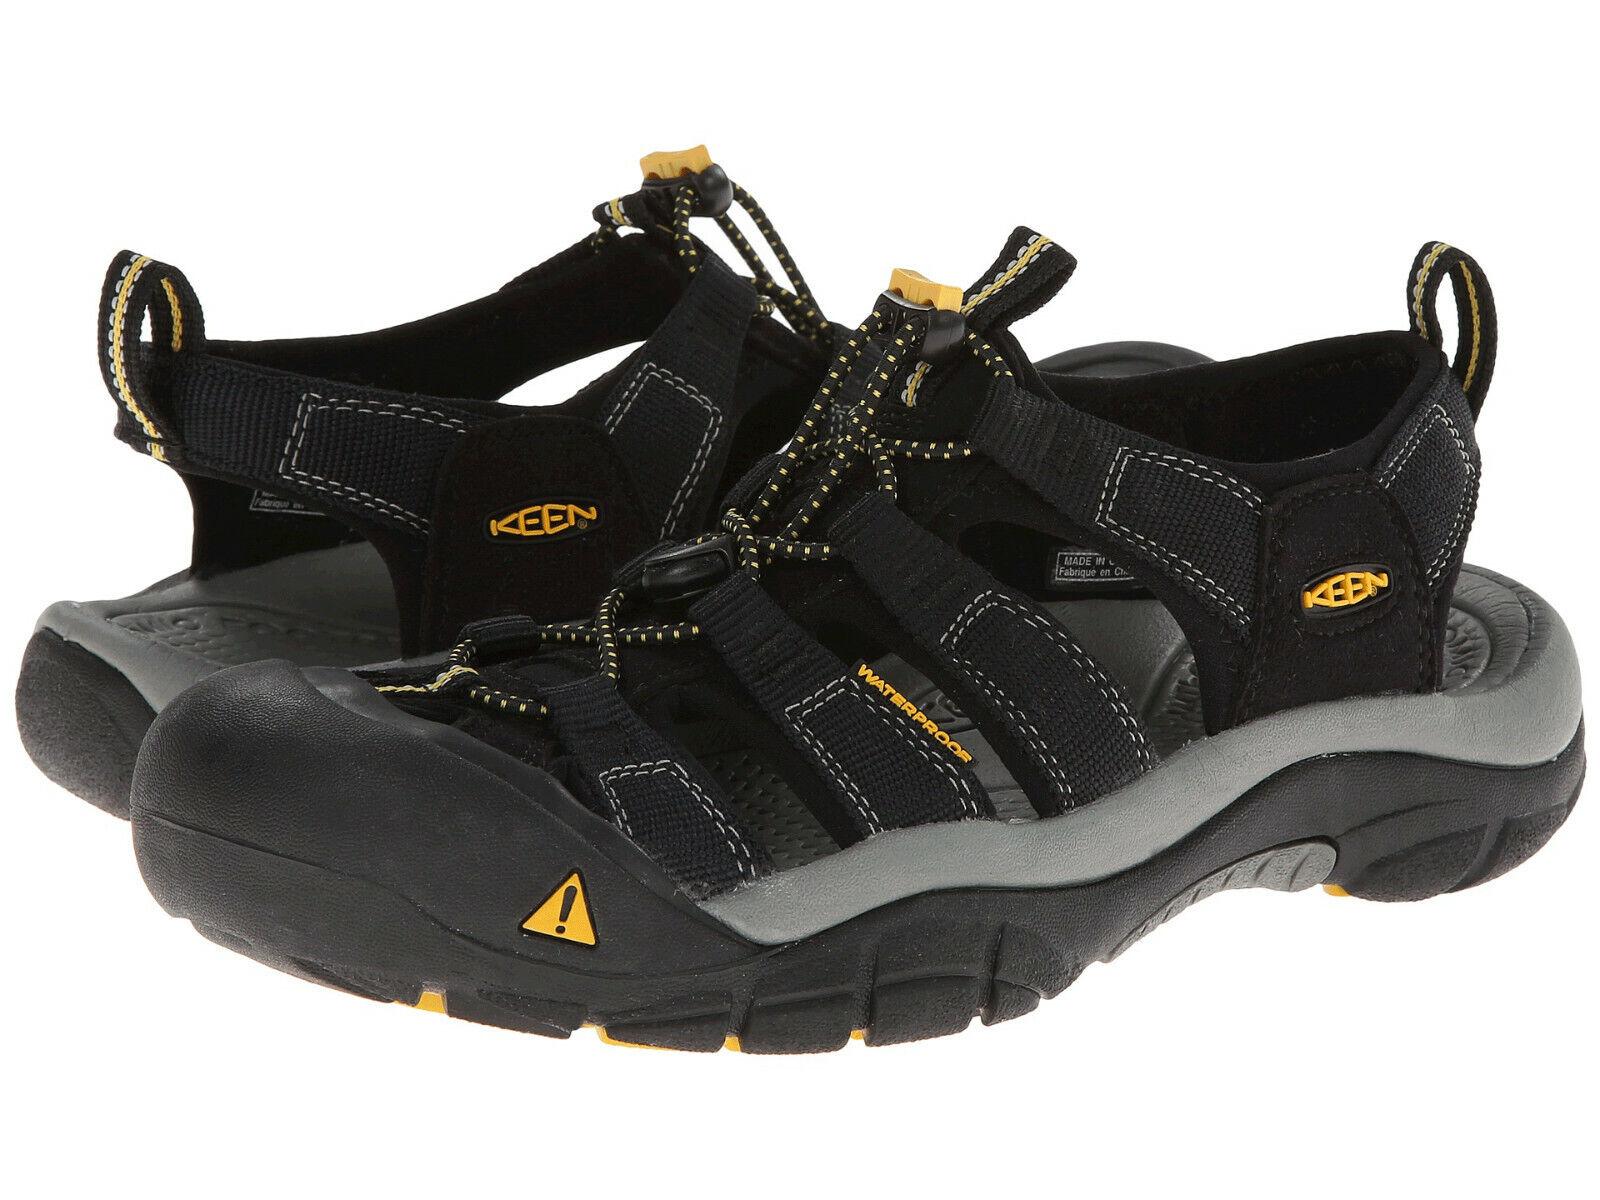 KEEN Men's Newport H2 Sandal Black (Select Size)